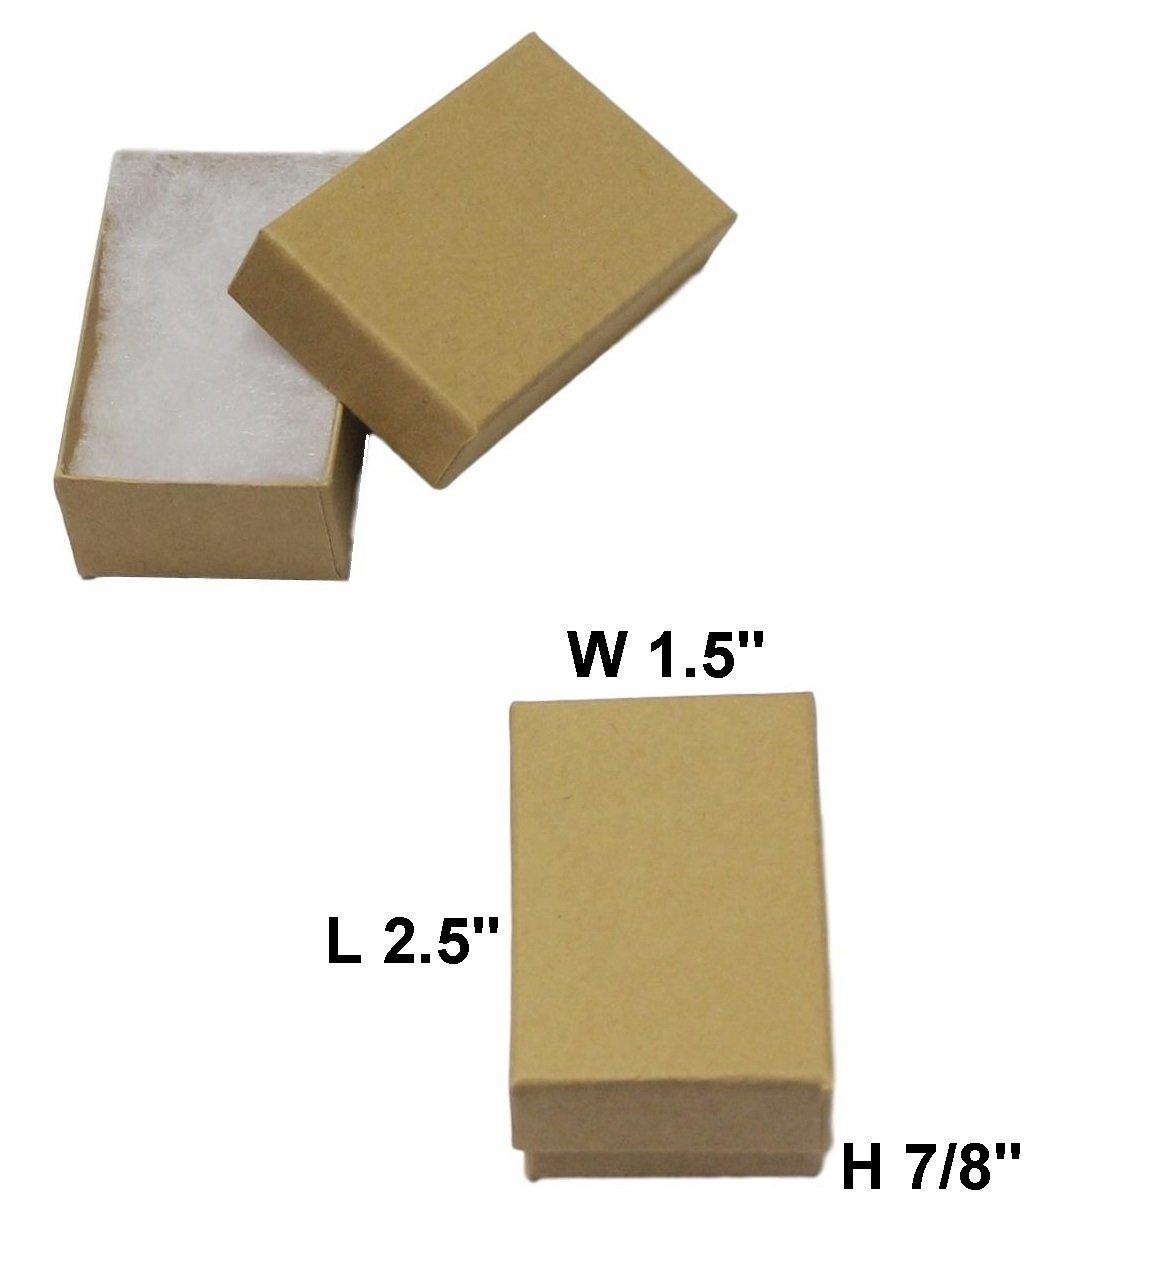 MSC Cotton Filled Jewelry Gift Box (Kraft) 2.5''x1.5''x7/8'' - #21 Pack of 40